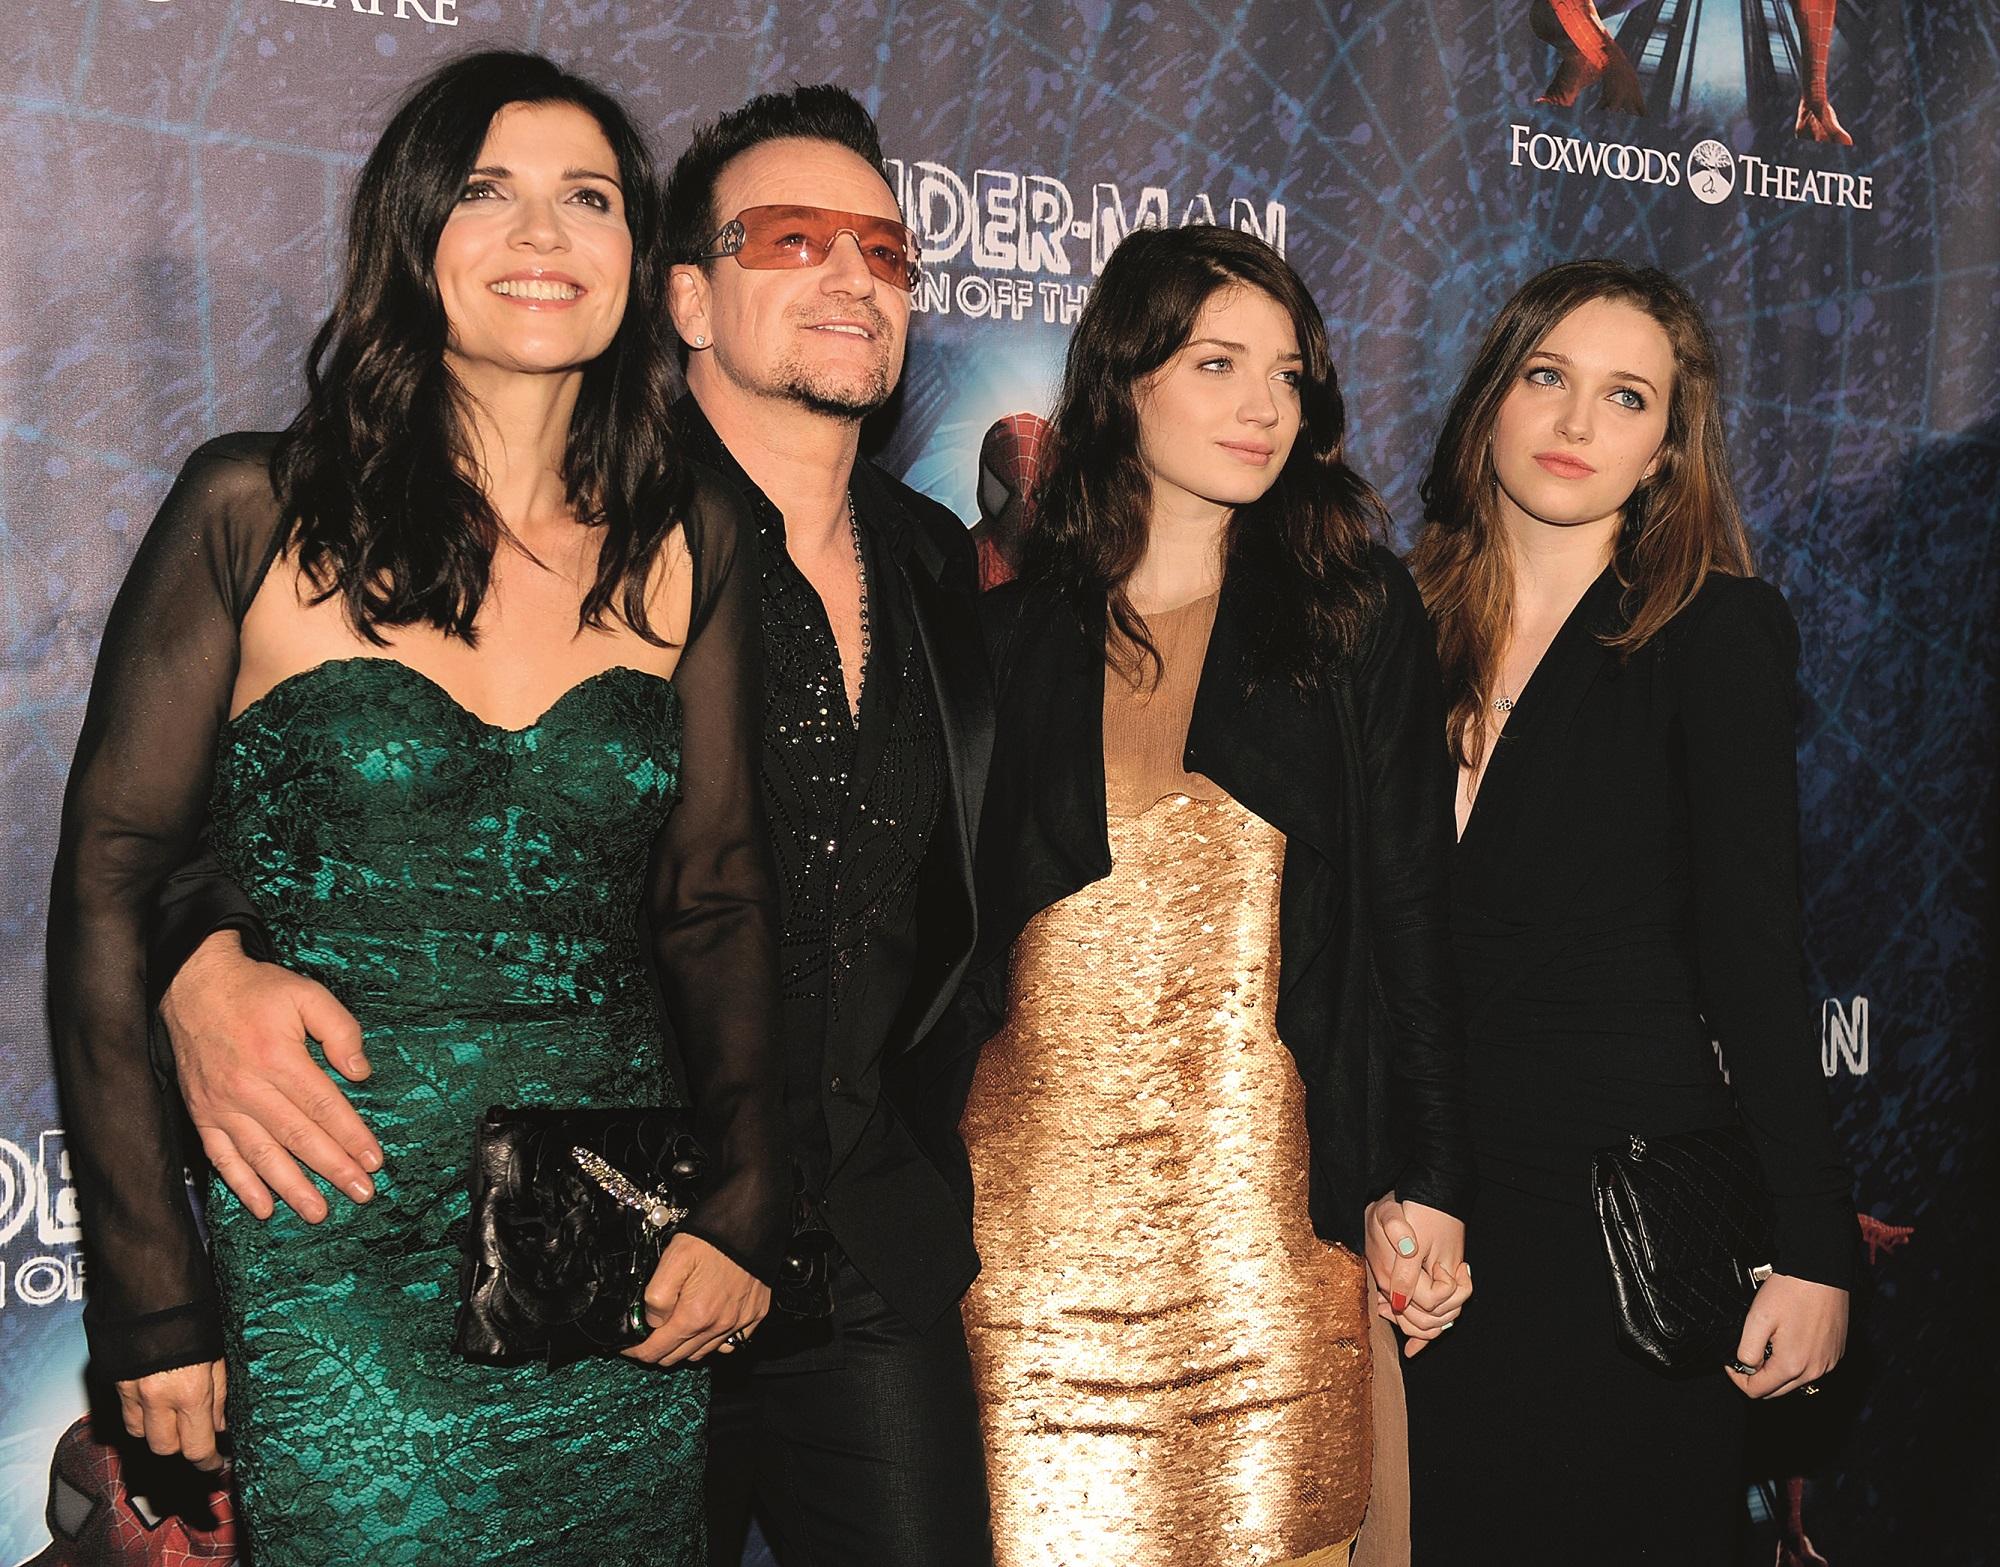 NEW YORK, NY - JUNE 14:  Ali Hewson, Bono of U2, Eve Hewson and Jordan Hewson attend